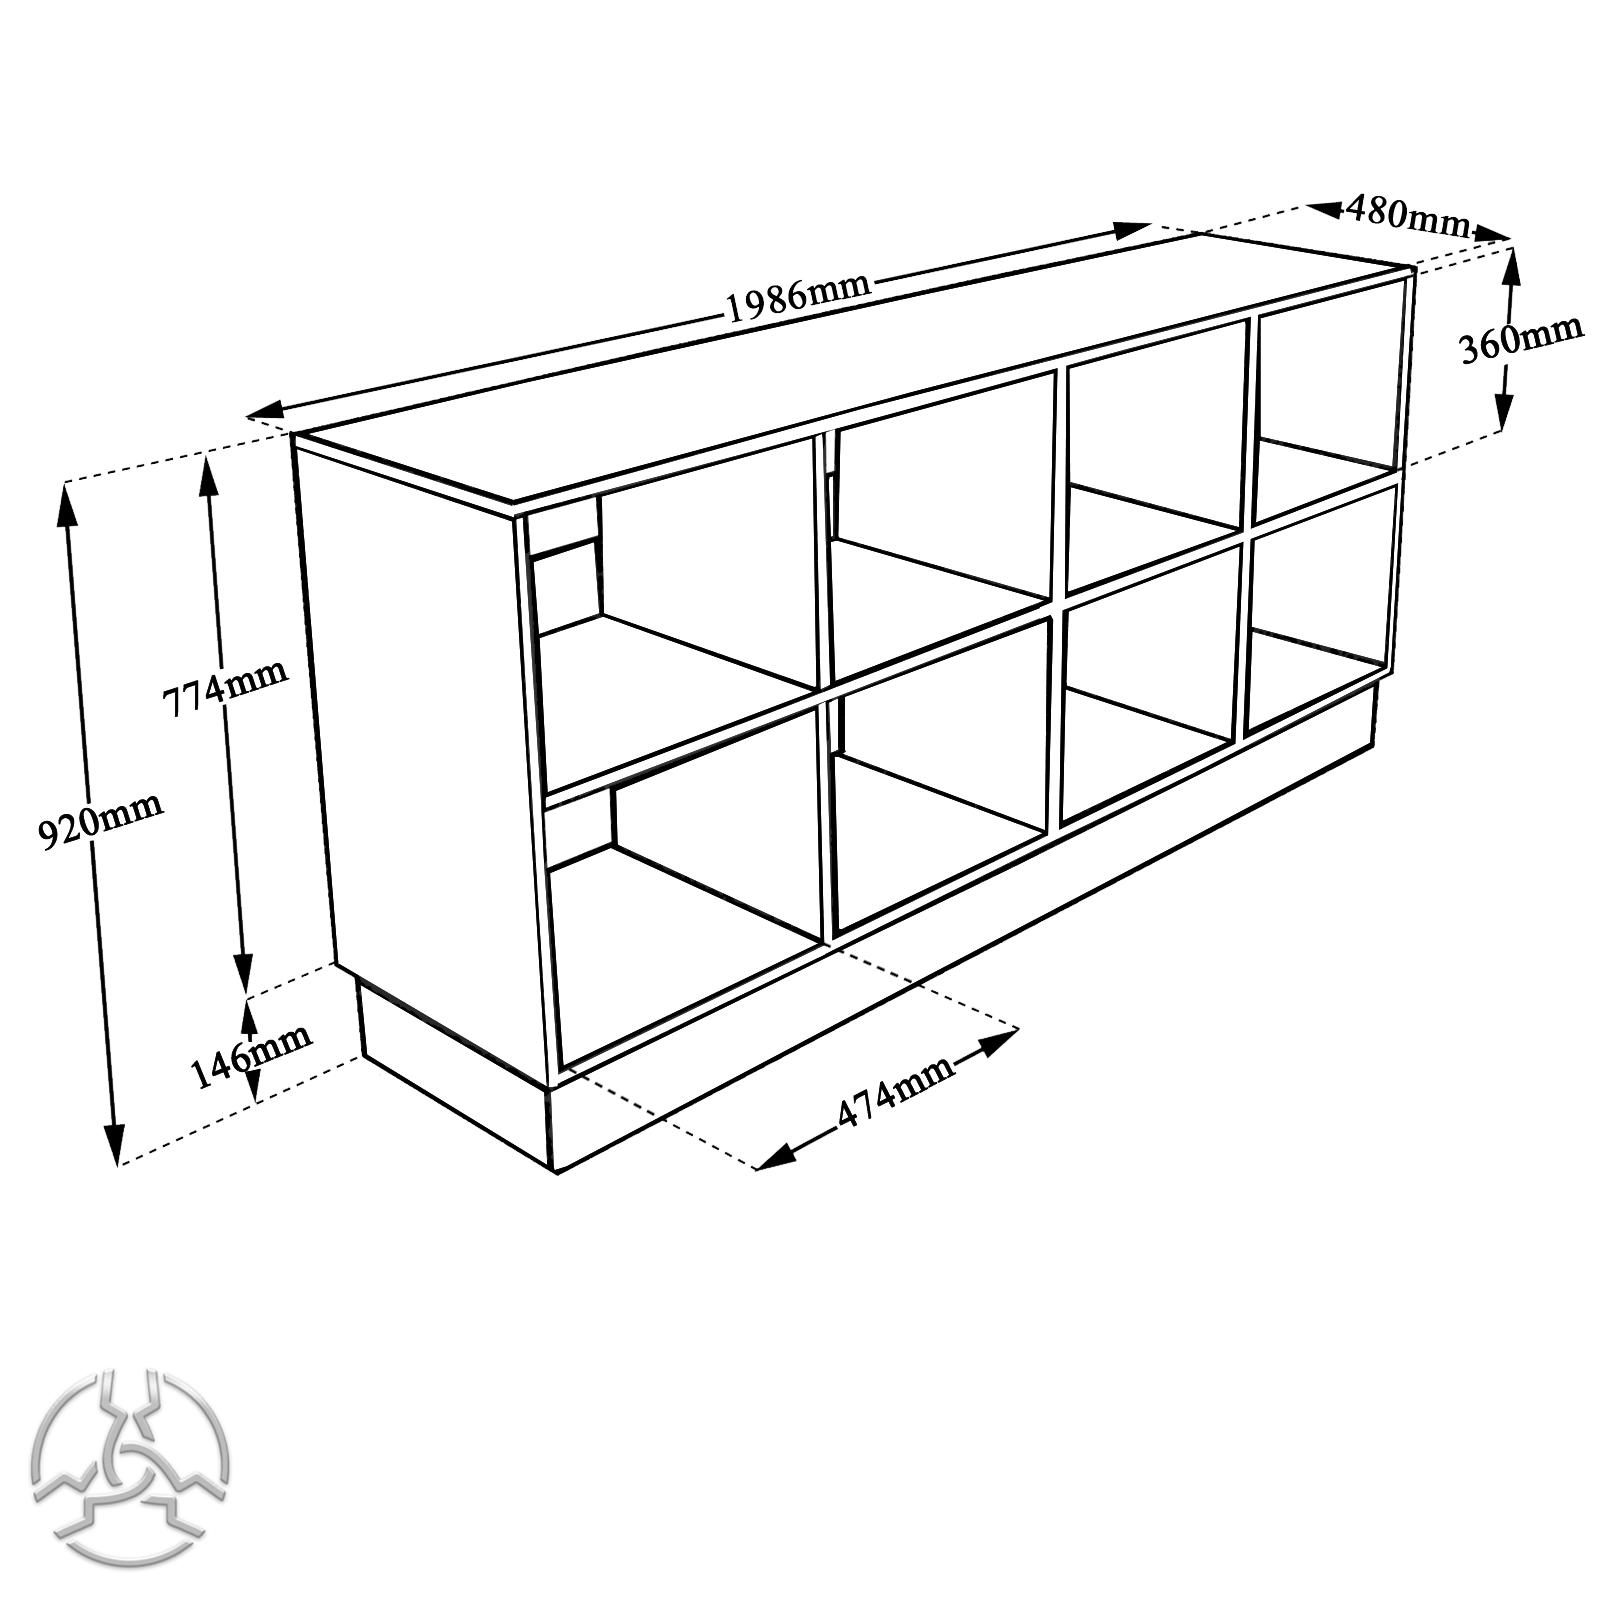 1600x1600 Ds2000 Big Dj Desk For Turntables Cdjs And Mixer